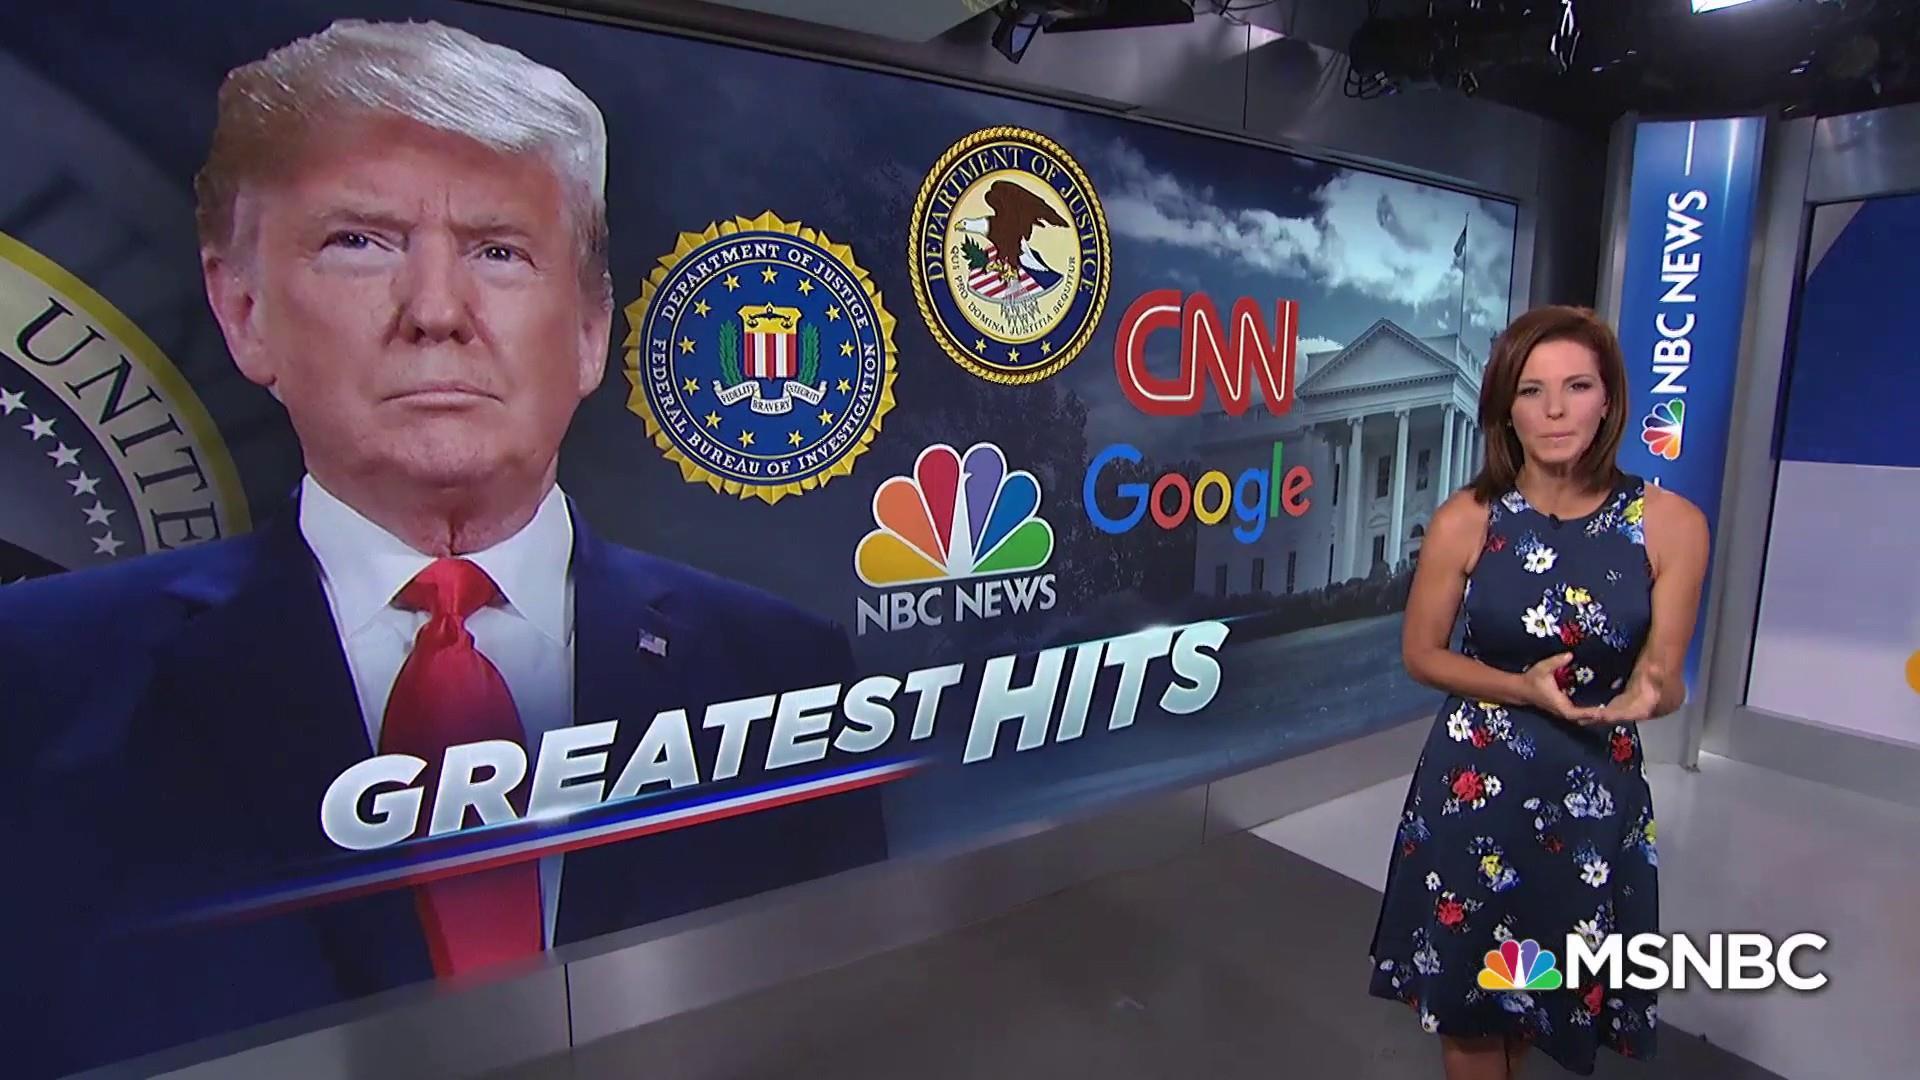 President Trump takes aim at DOJ, FBI, media, big tech at rally